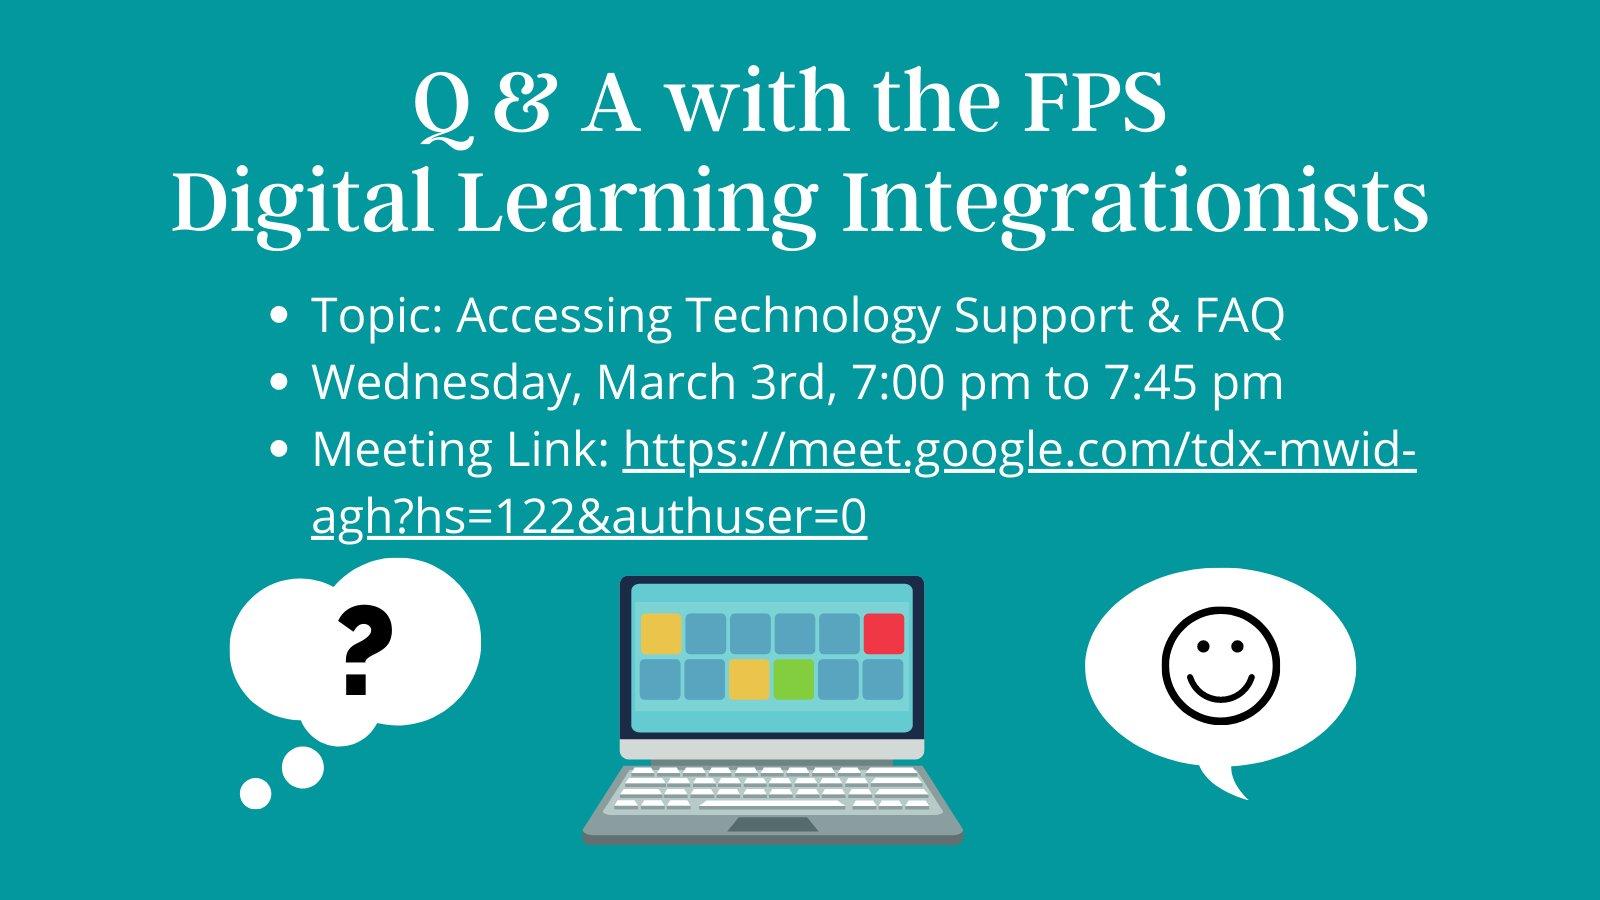 Digital Learning Integrationist Team: Q&A session - Mar 3